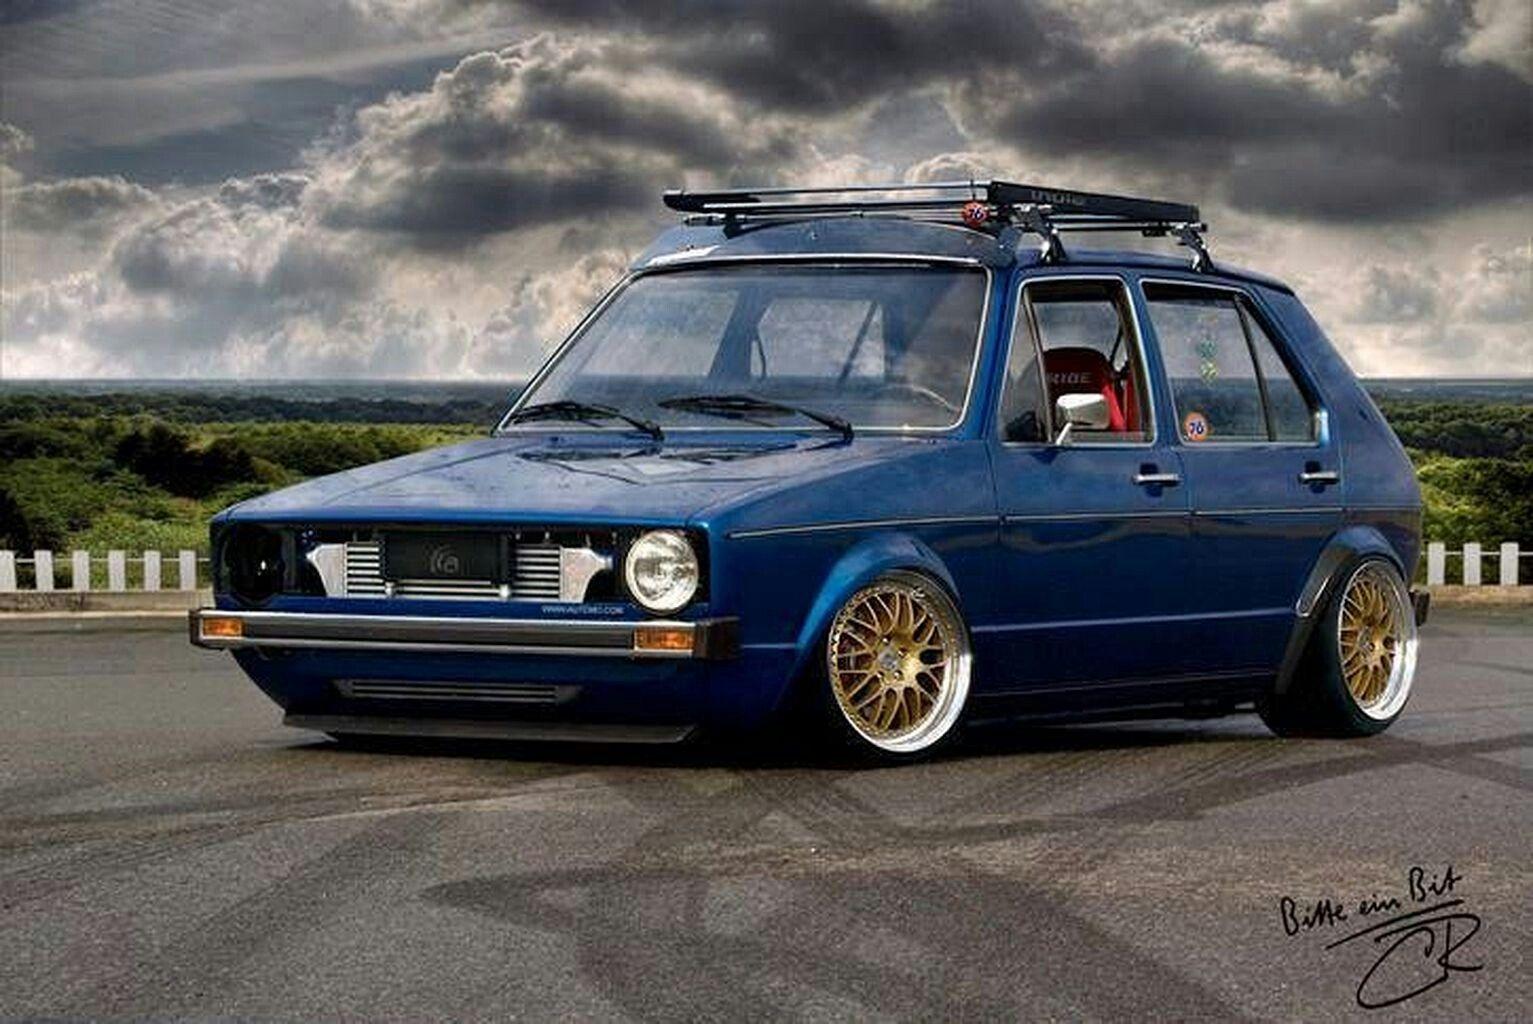 Mk2 Golf Roof Rack | www.topsimages.com